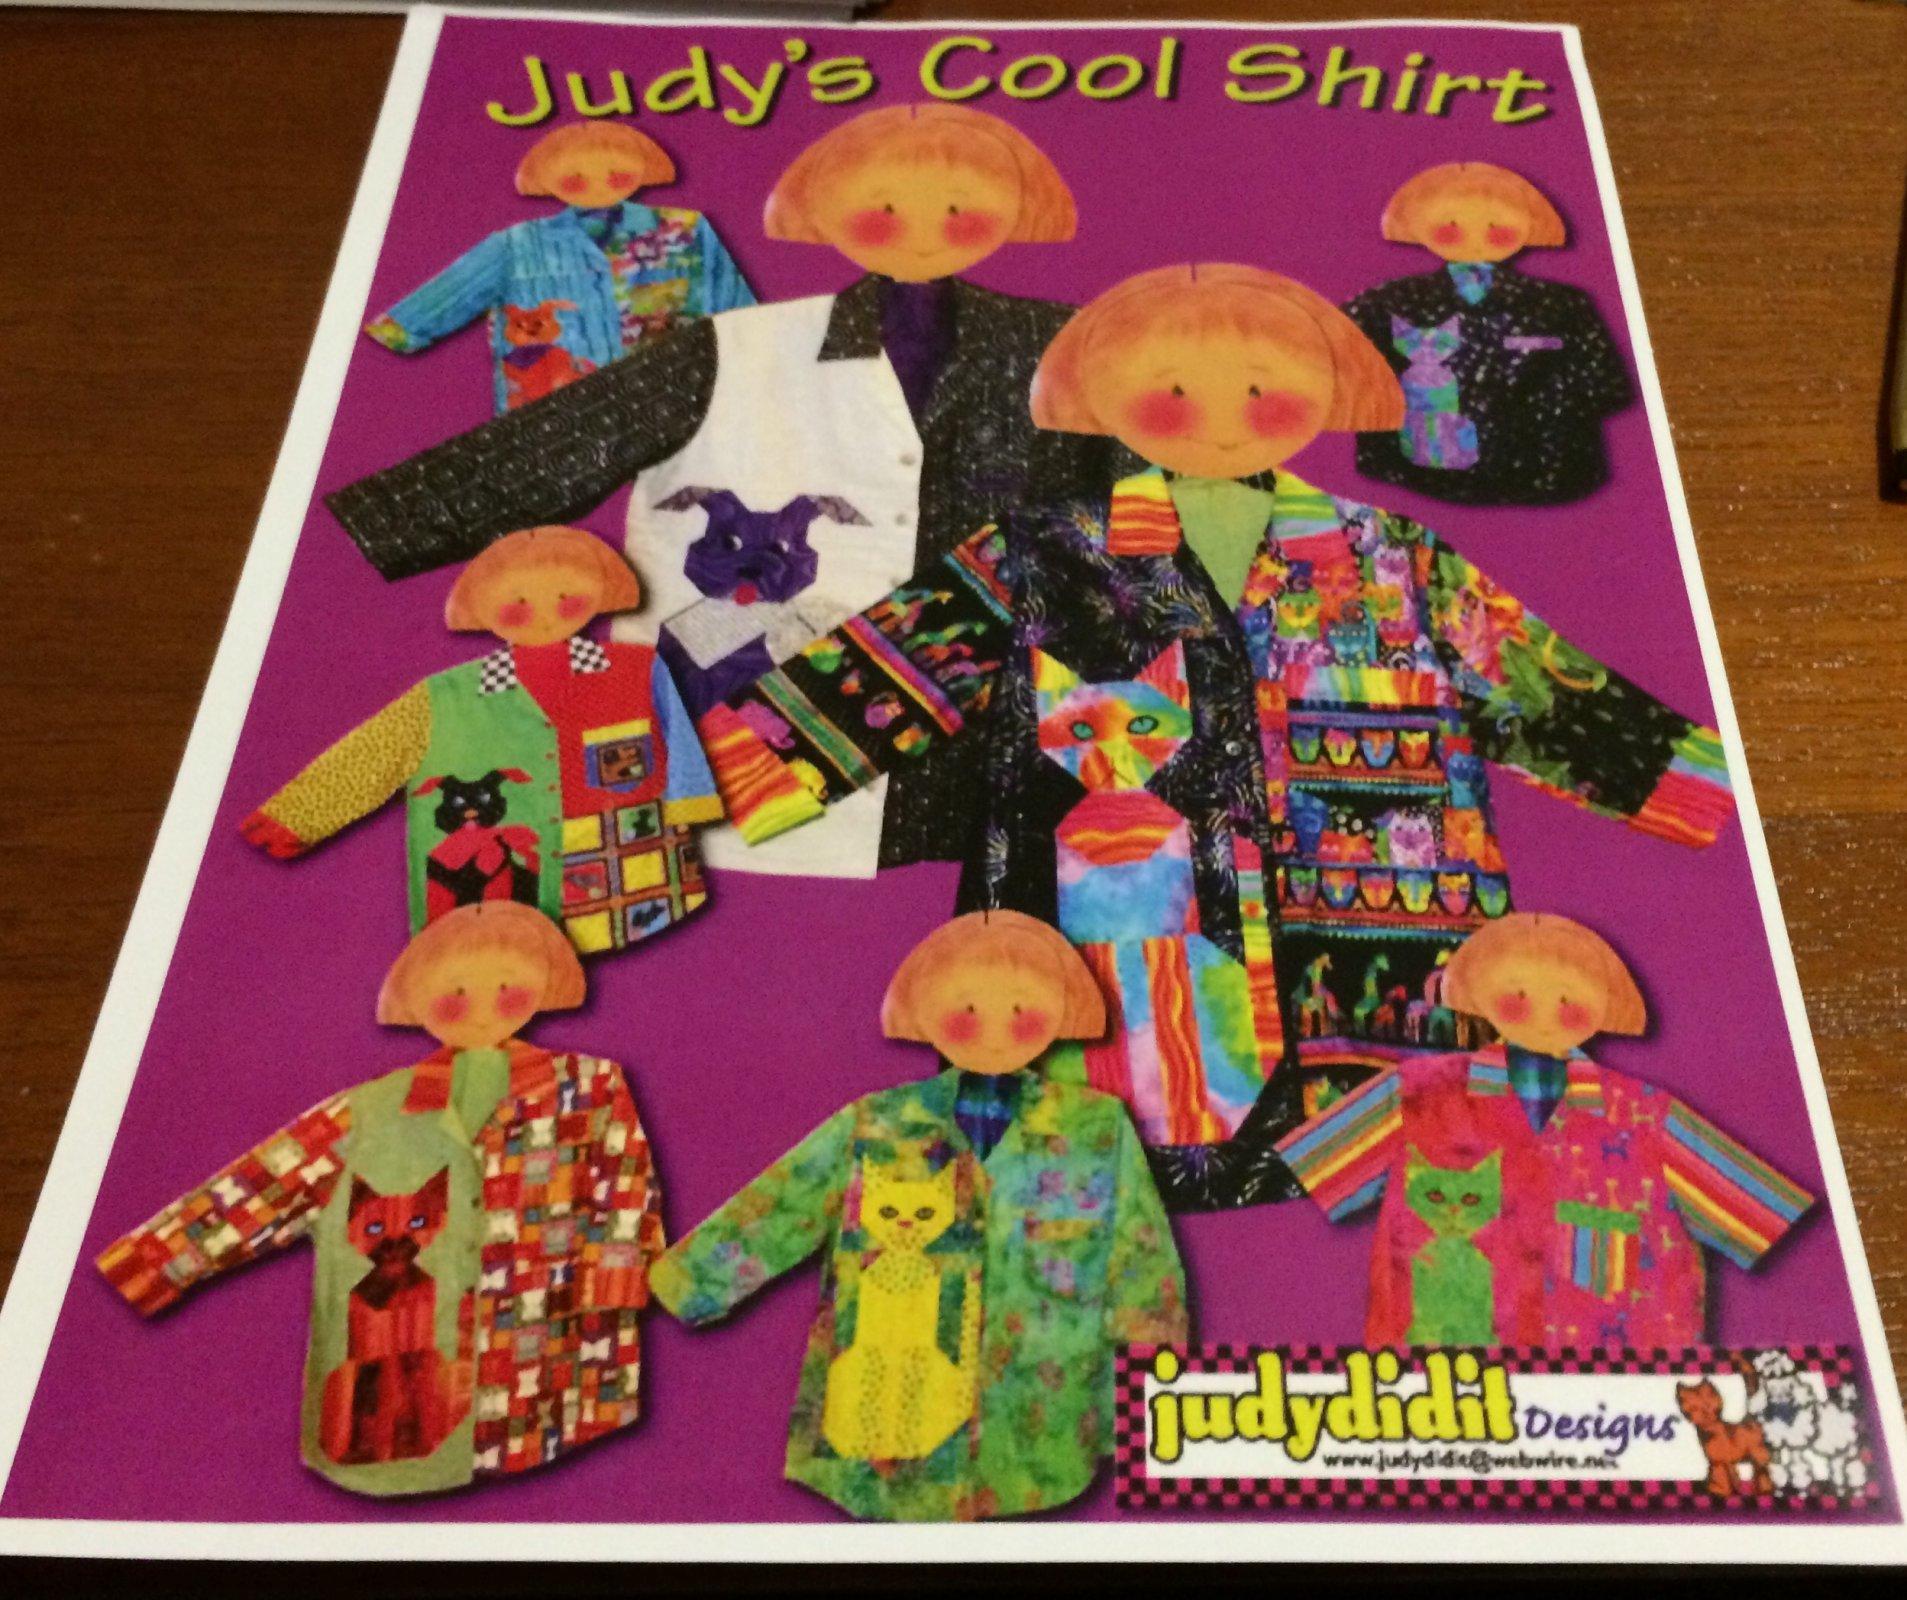 Judy's Cool Shirt by Judydidit Designs